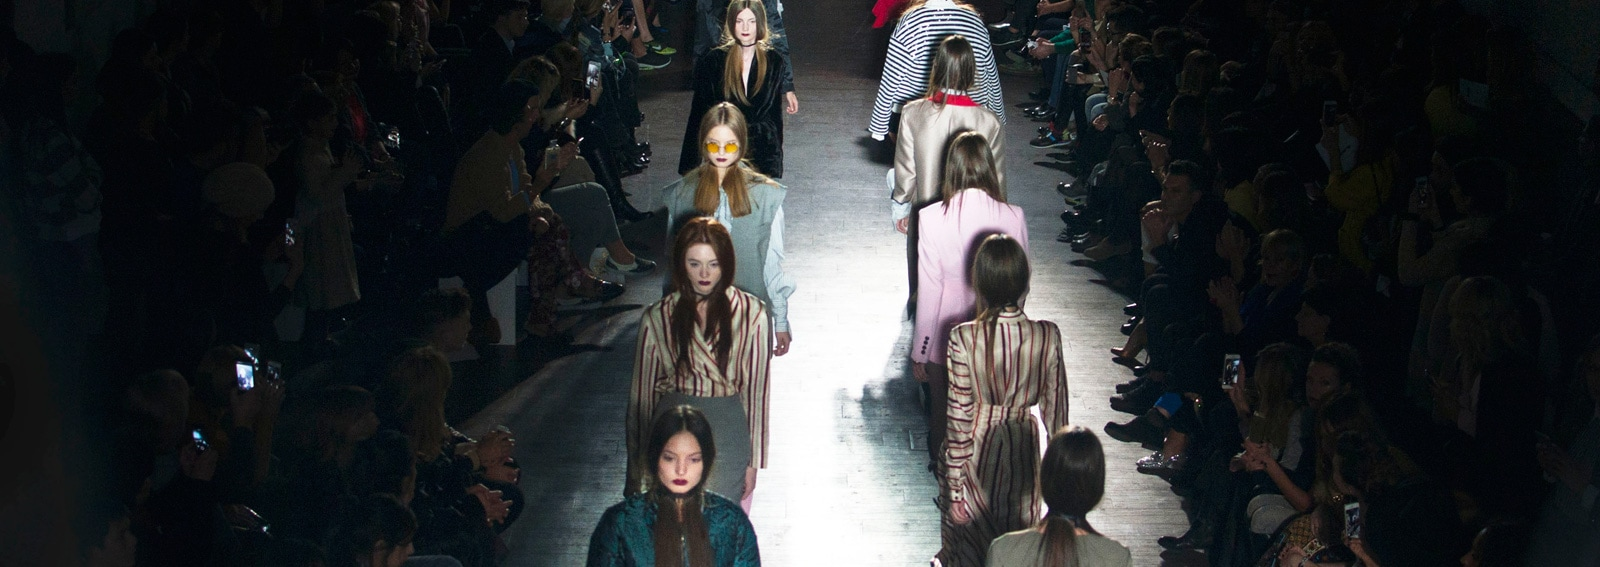 cover-mercedes-benz-fashion-week-tbilisi-desktop